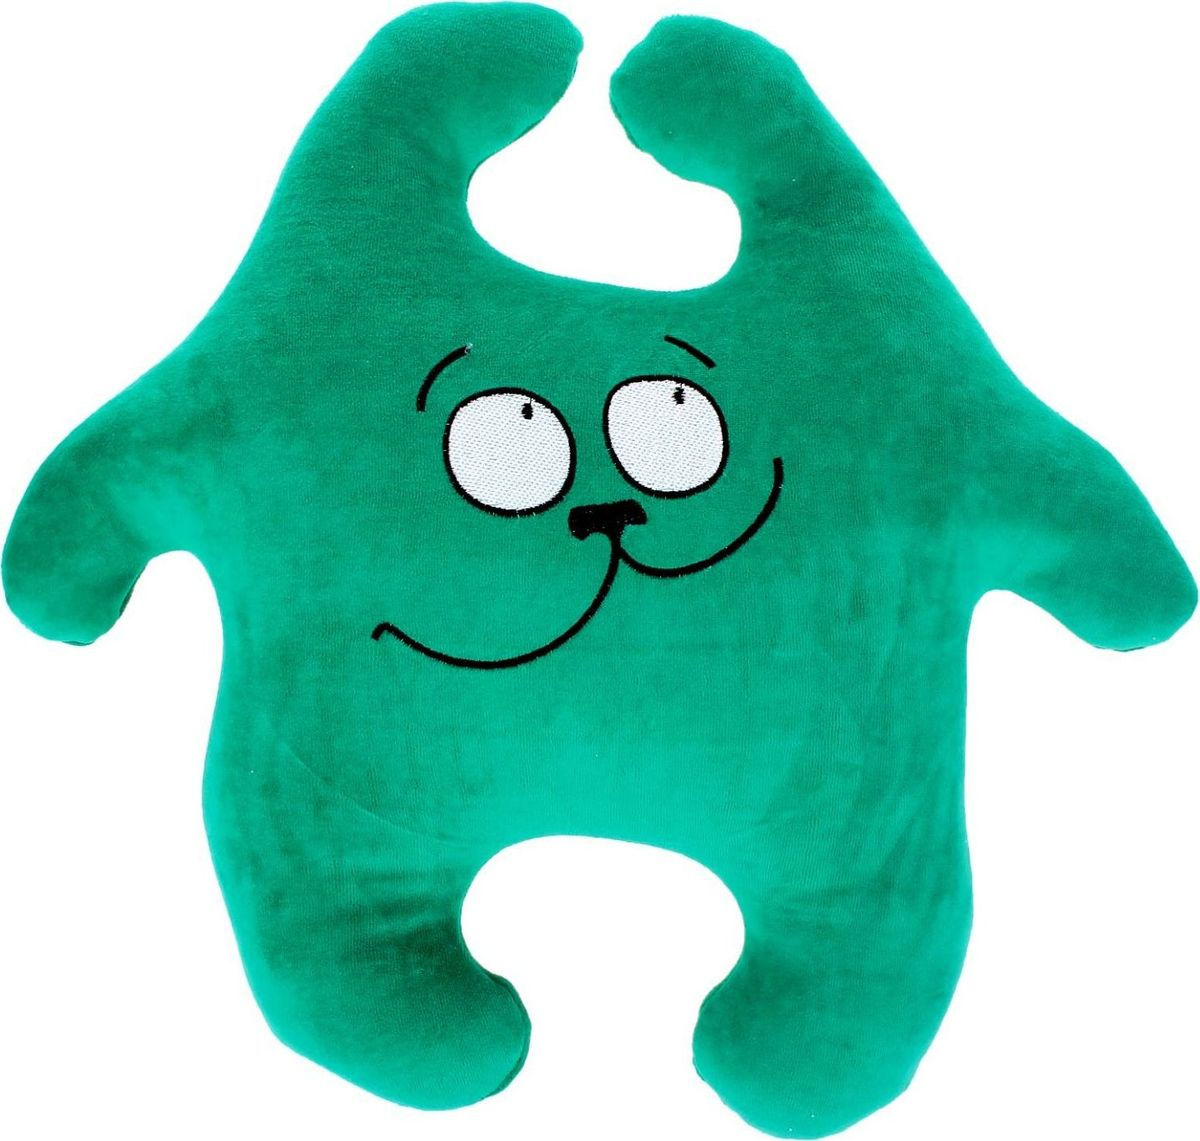 Sima-land Антистрессовая игрушка Заяц Хрустик 04 цвет зеленый sima land антистрессовая игрушка заяц хрустик 04 цвет желтый